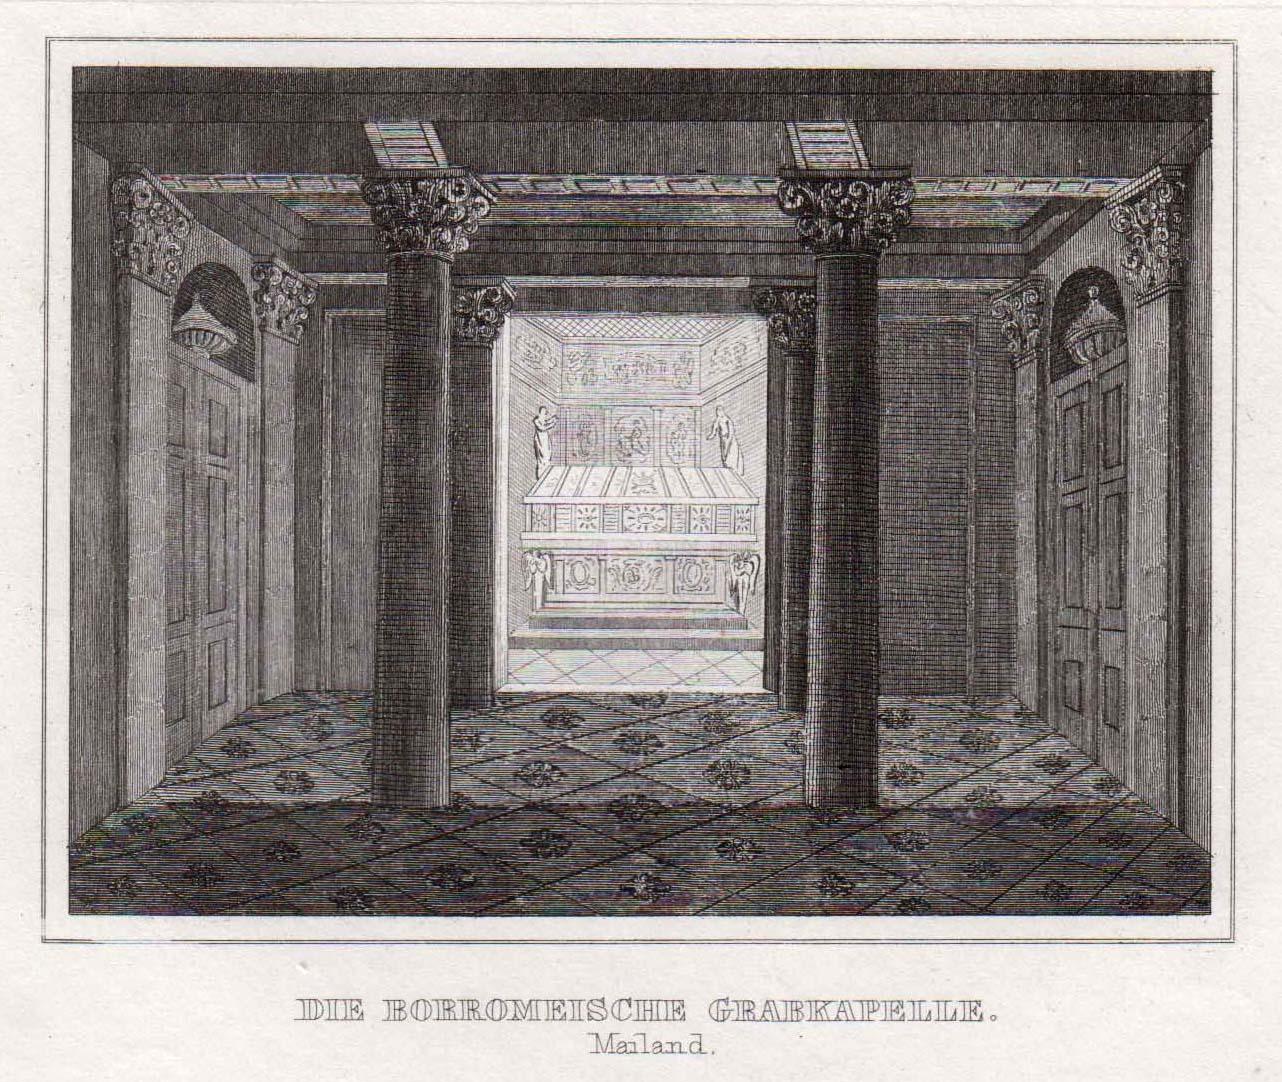 TA., Grabkapelle des Borromäus.: Mailand ( Milano